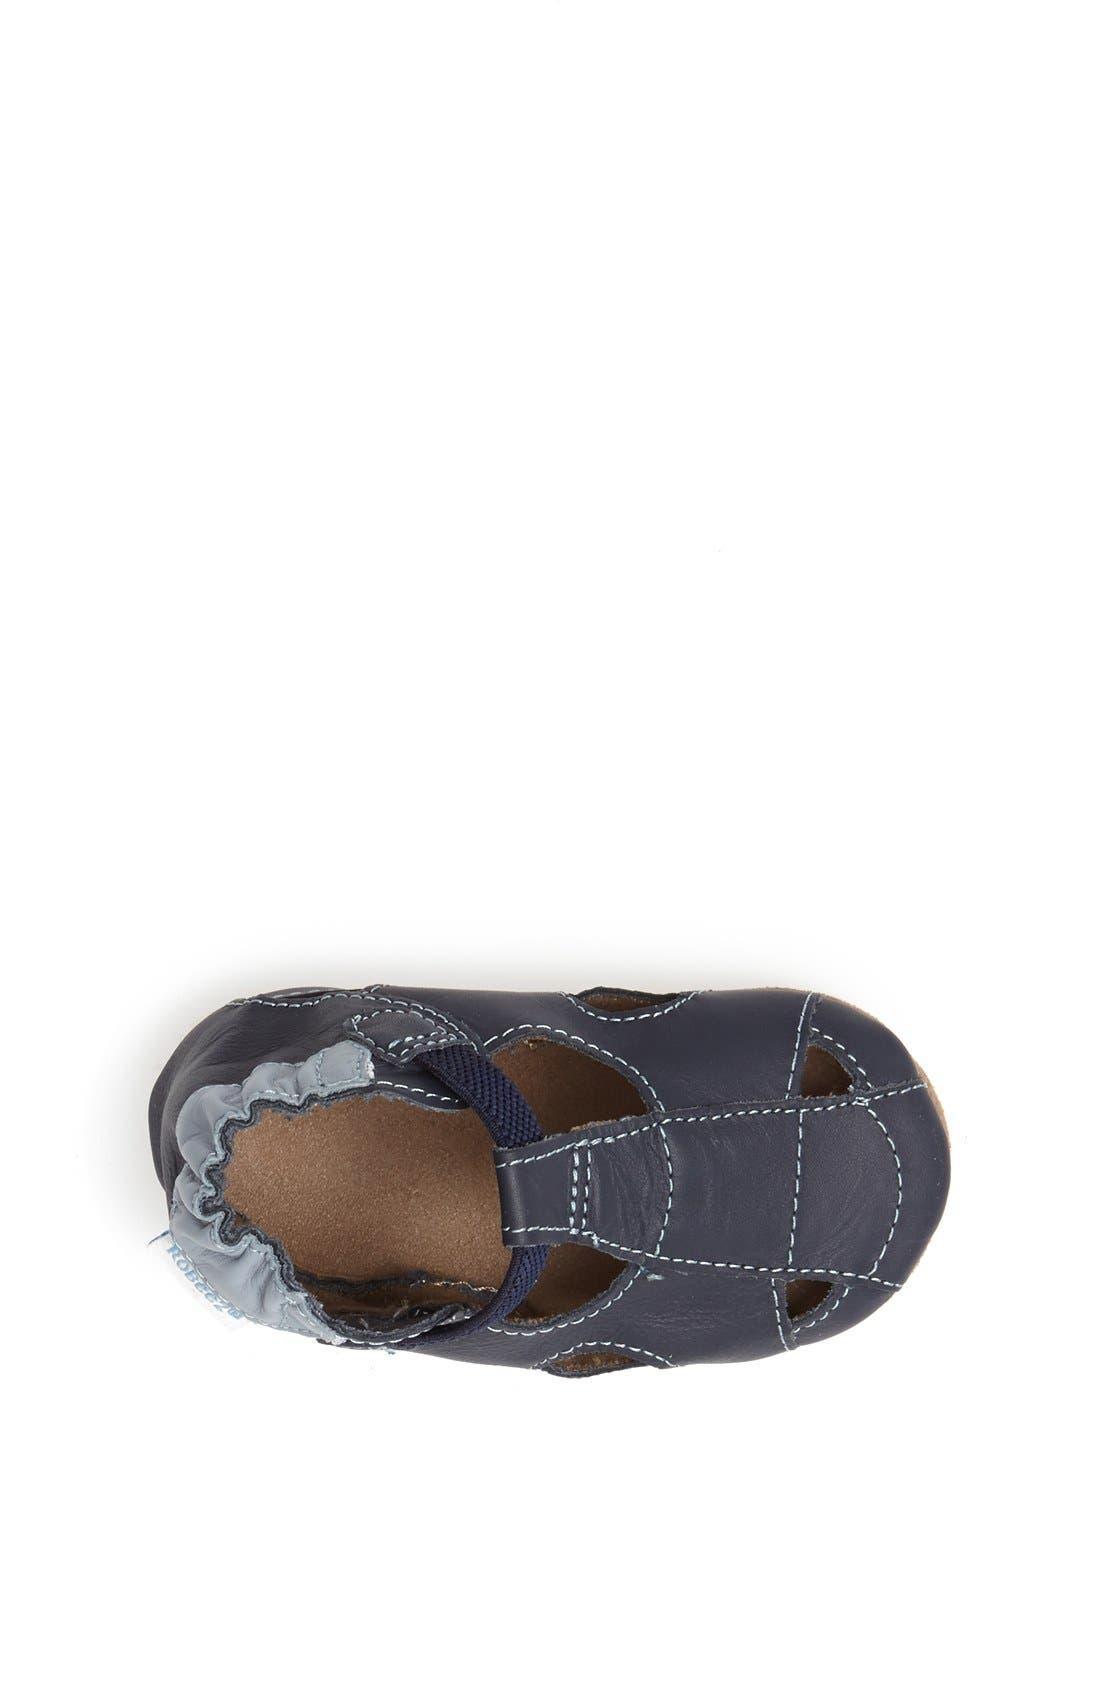 Alternate Image 3  - Robeez® Fisherman Sandal (Baby & Walker)